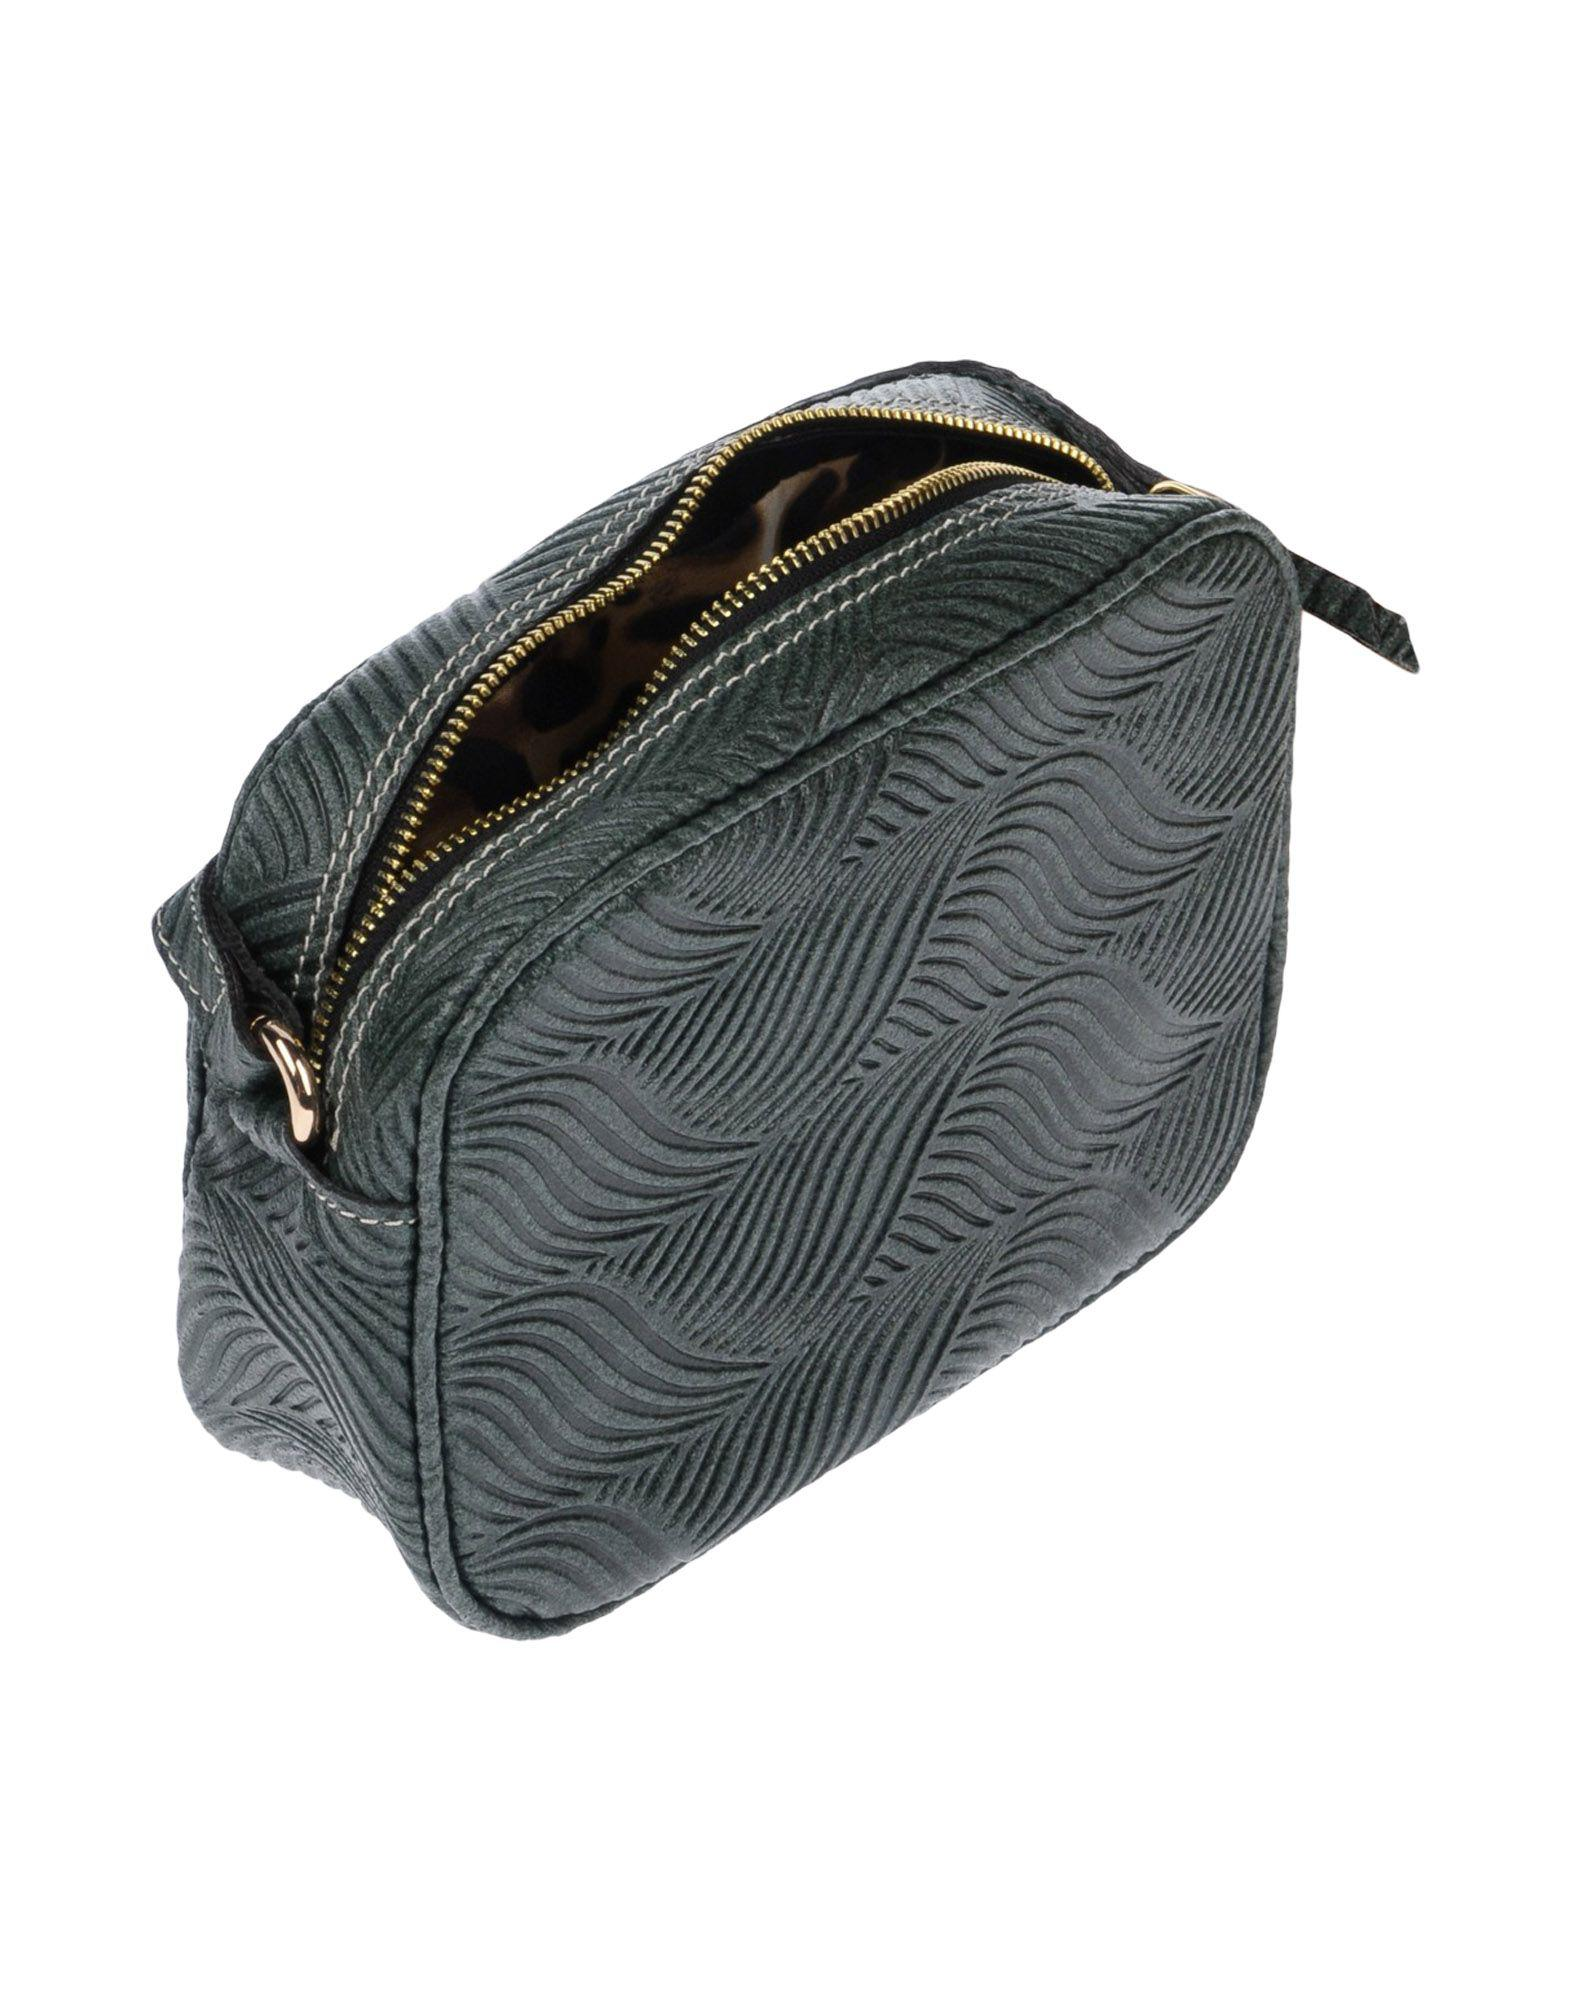 Manifatture Campane Leather Cross-body Bag in Dark Green (Green)